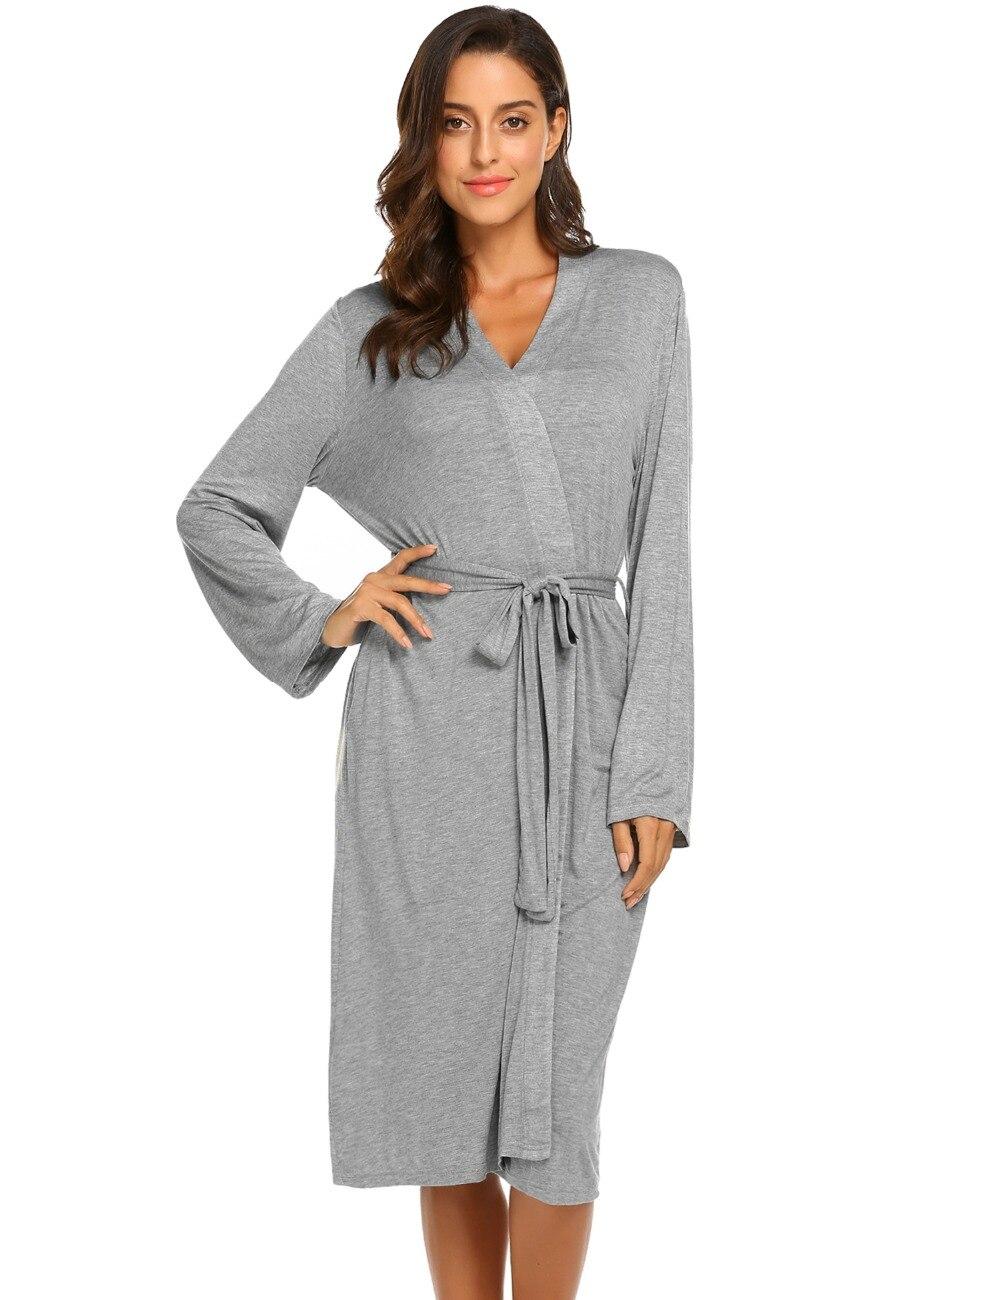 c2cf8868a2 Ekouaer Women Sleep Robes Nighties Long Sleeve Solid Kimono Robe Nightgown  Spa Bathrobe Sleepwear Dressing Gown Female Homewear